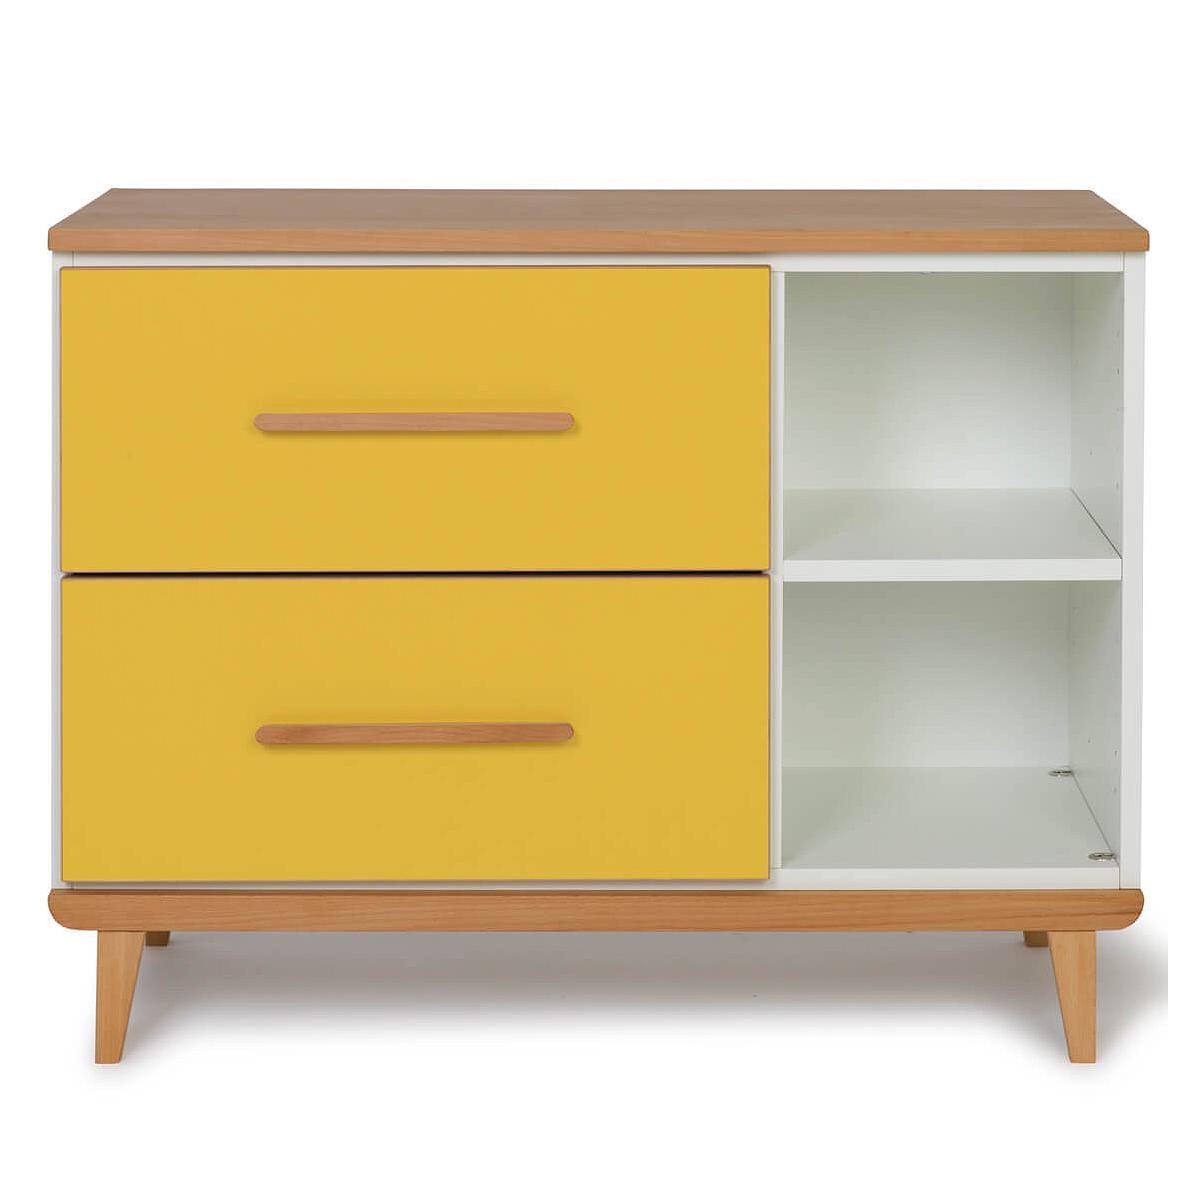 Wookids - Petit meuble 2 tiroirs NADO yellow